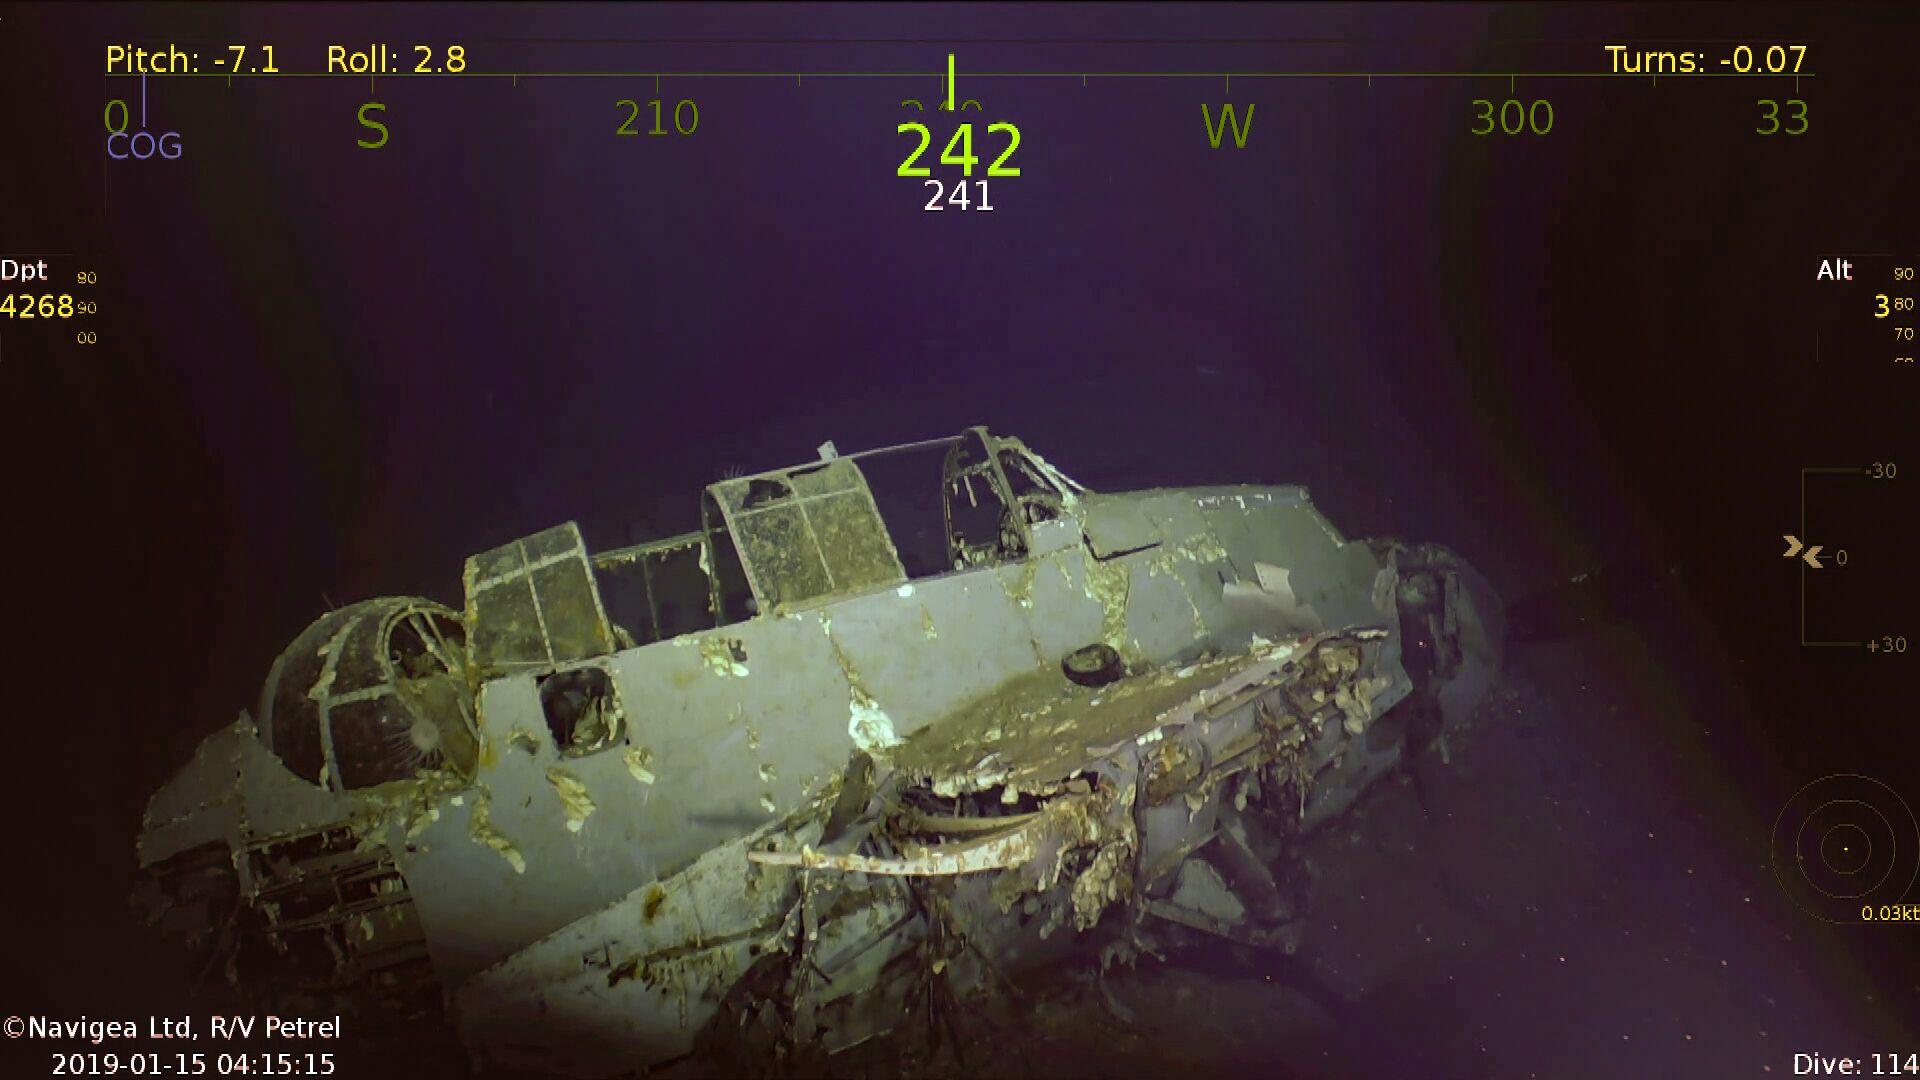 USNI News Fleet and Marine Tracker: June 17, 2019